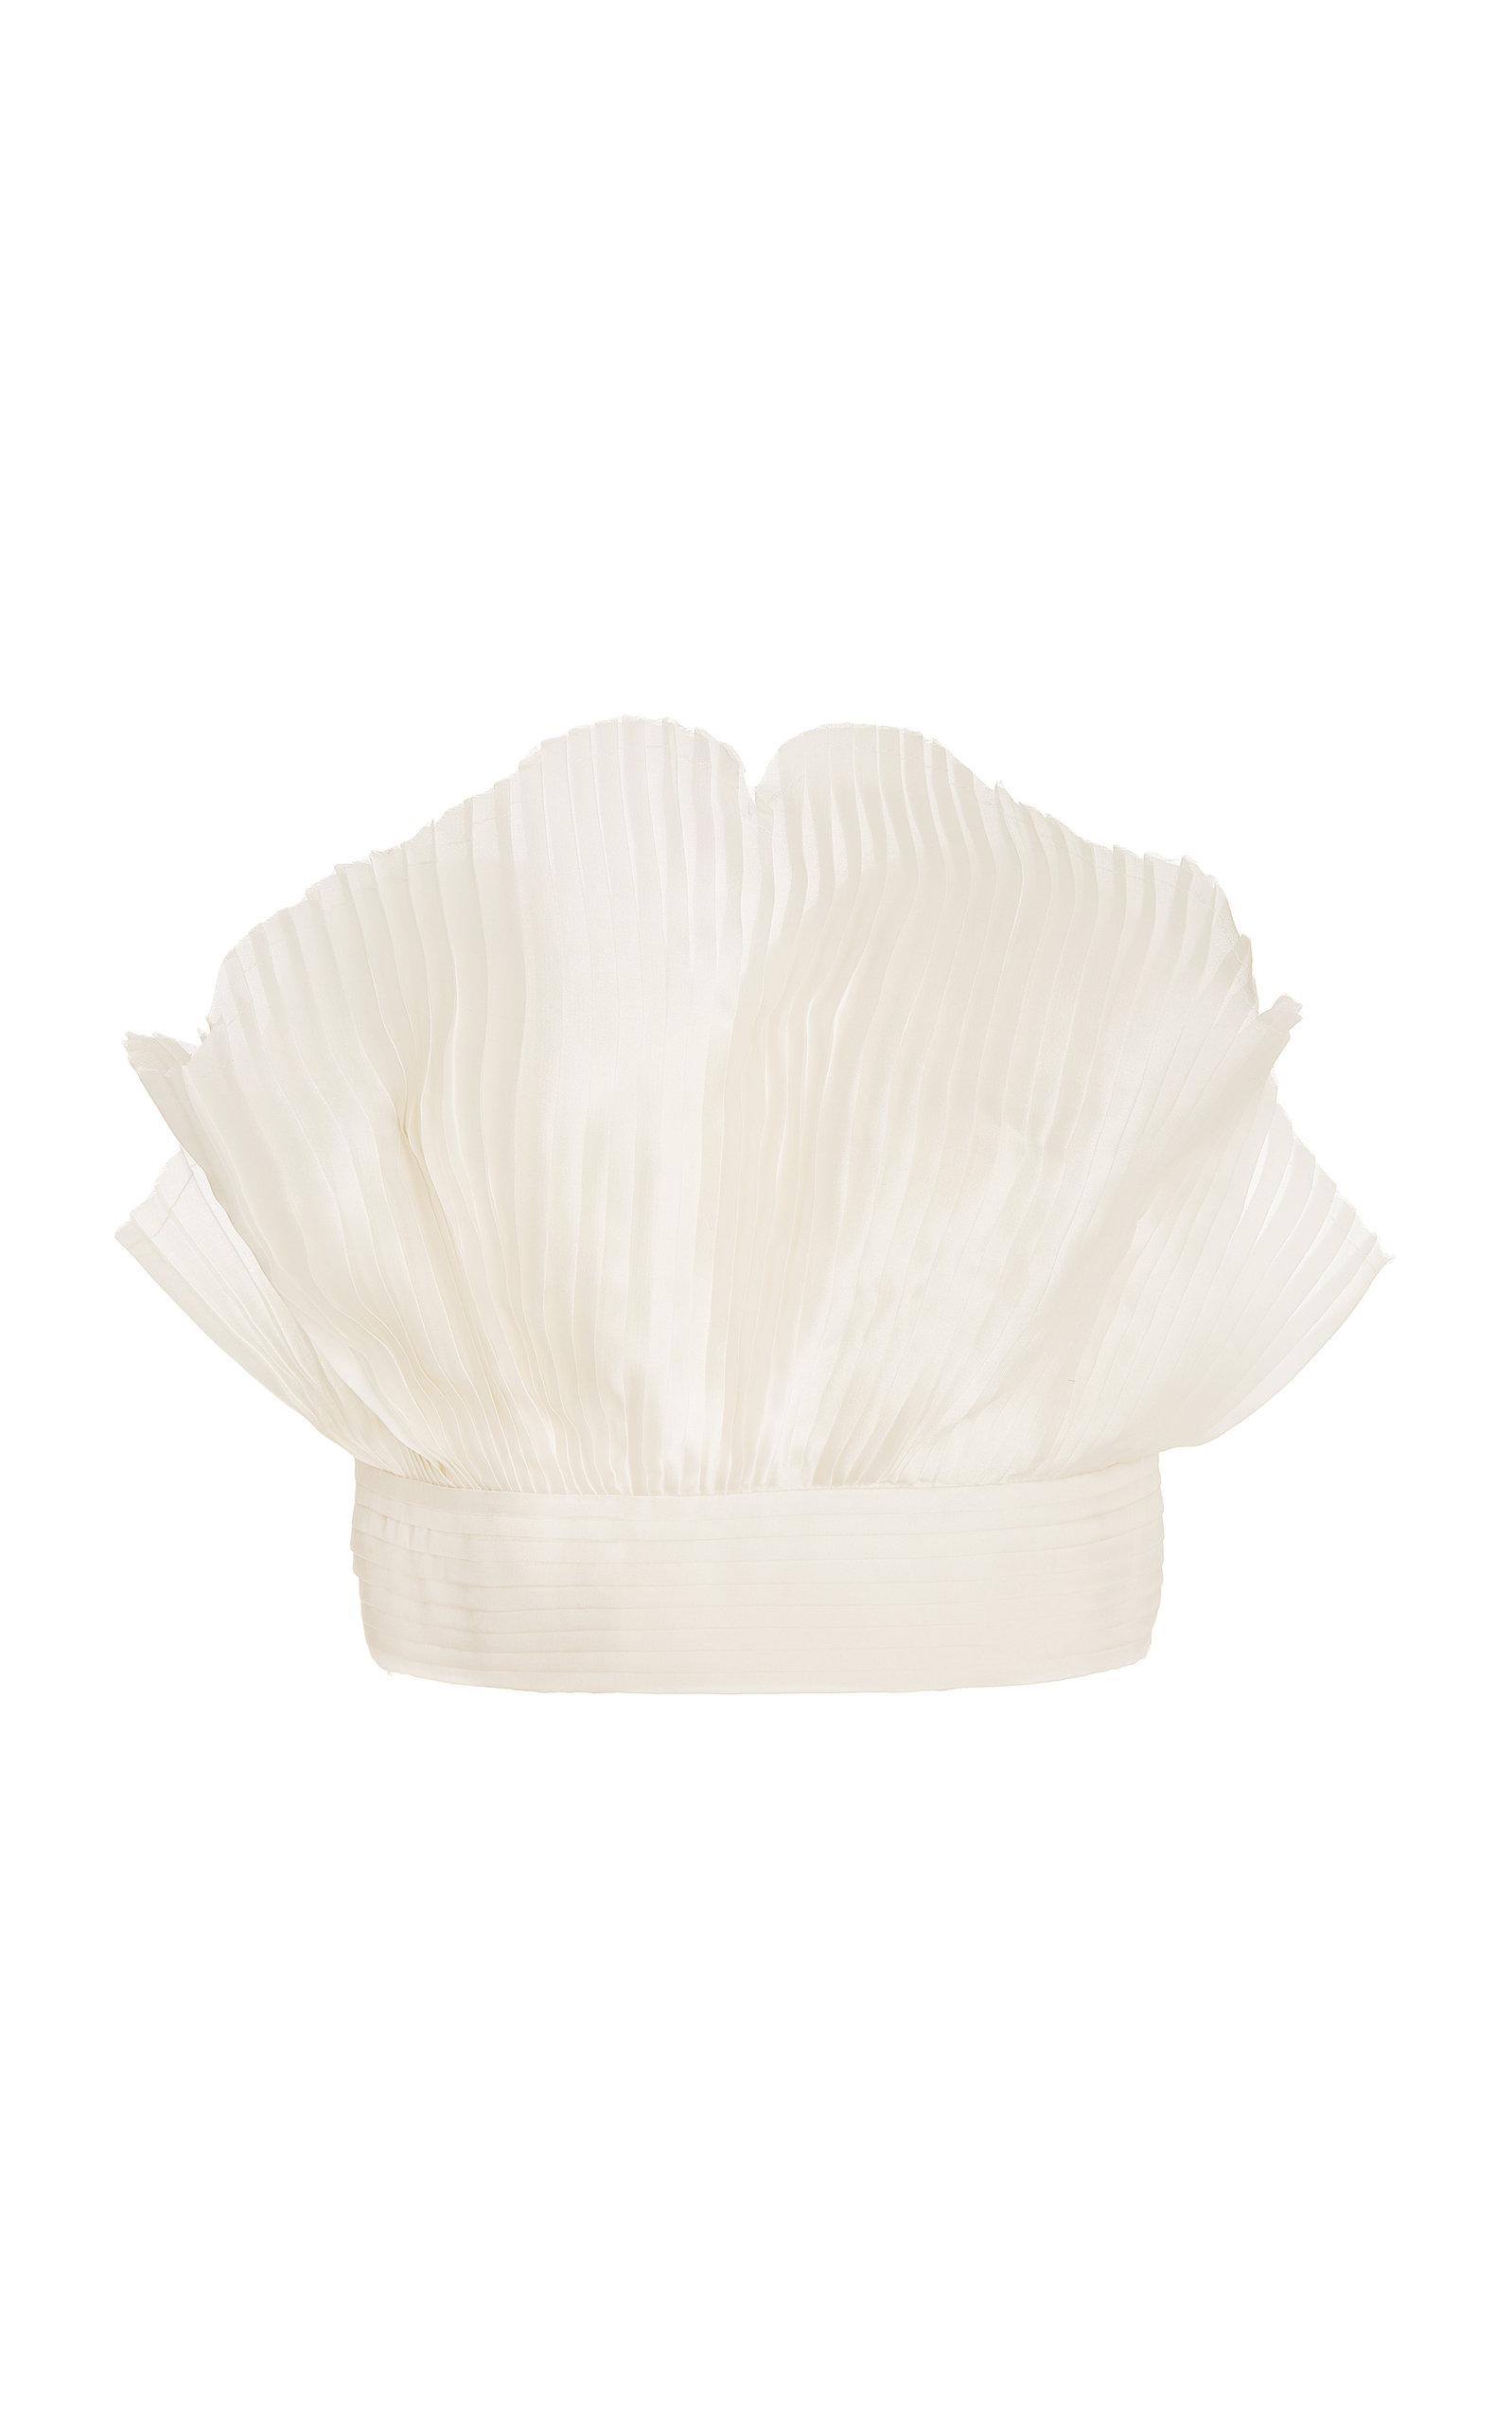 Women's Gingko Pleated Silk Strapless Crop Top